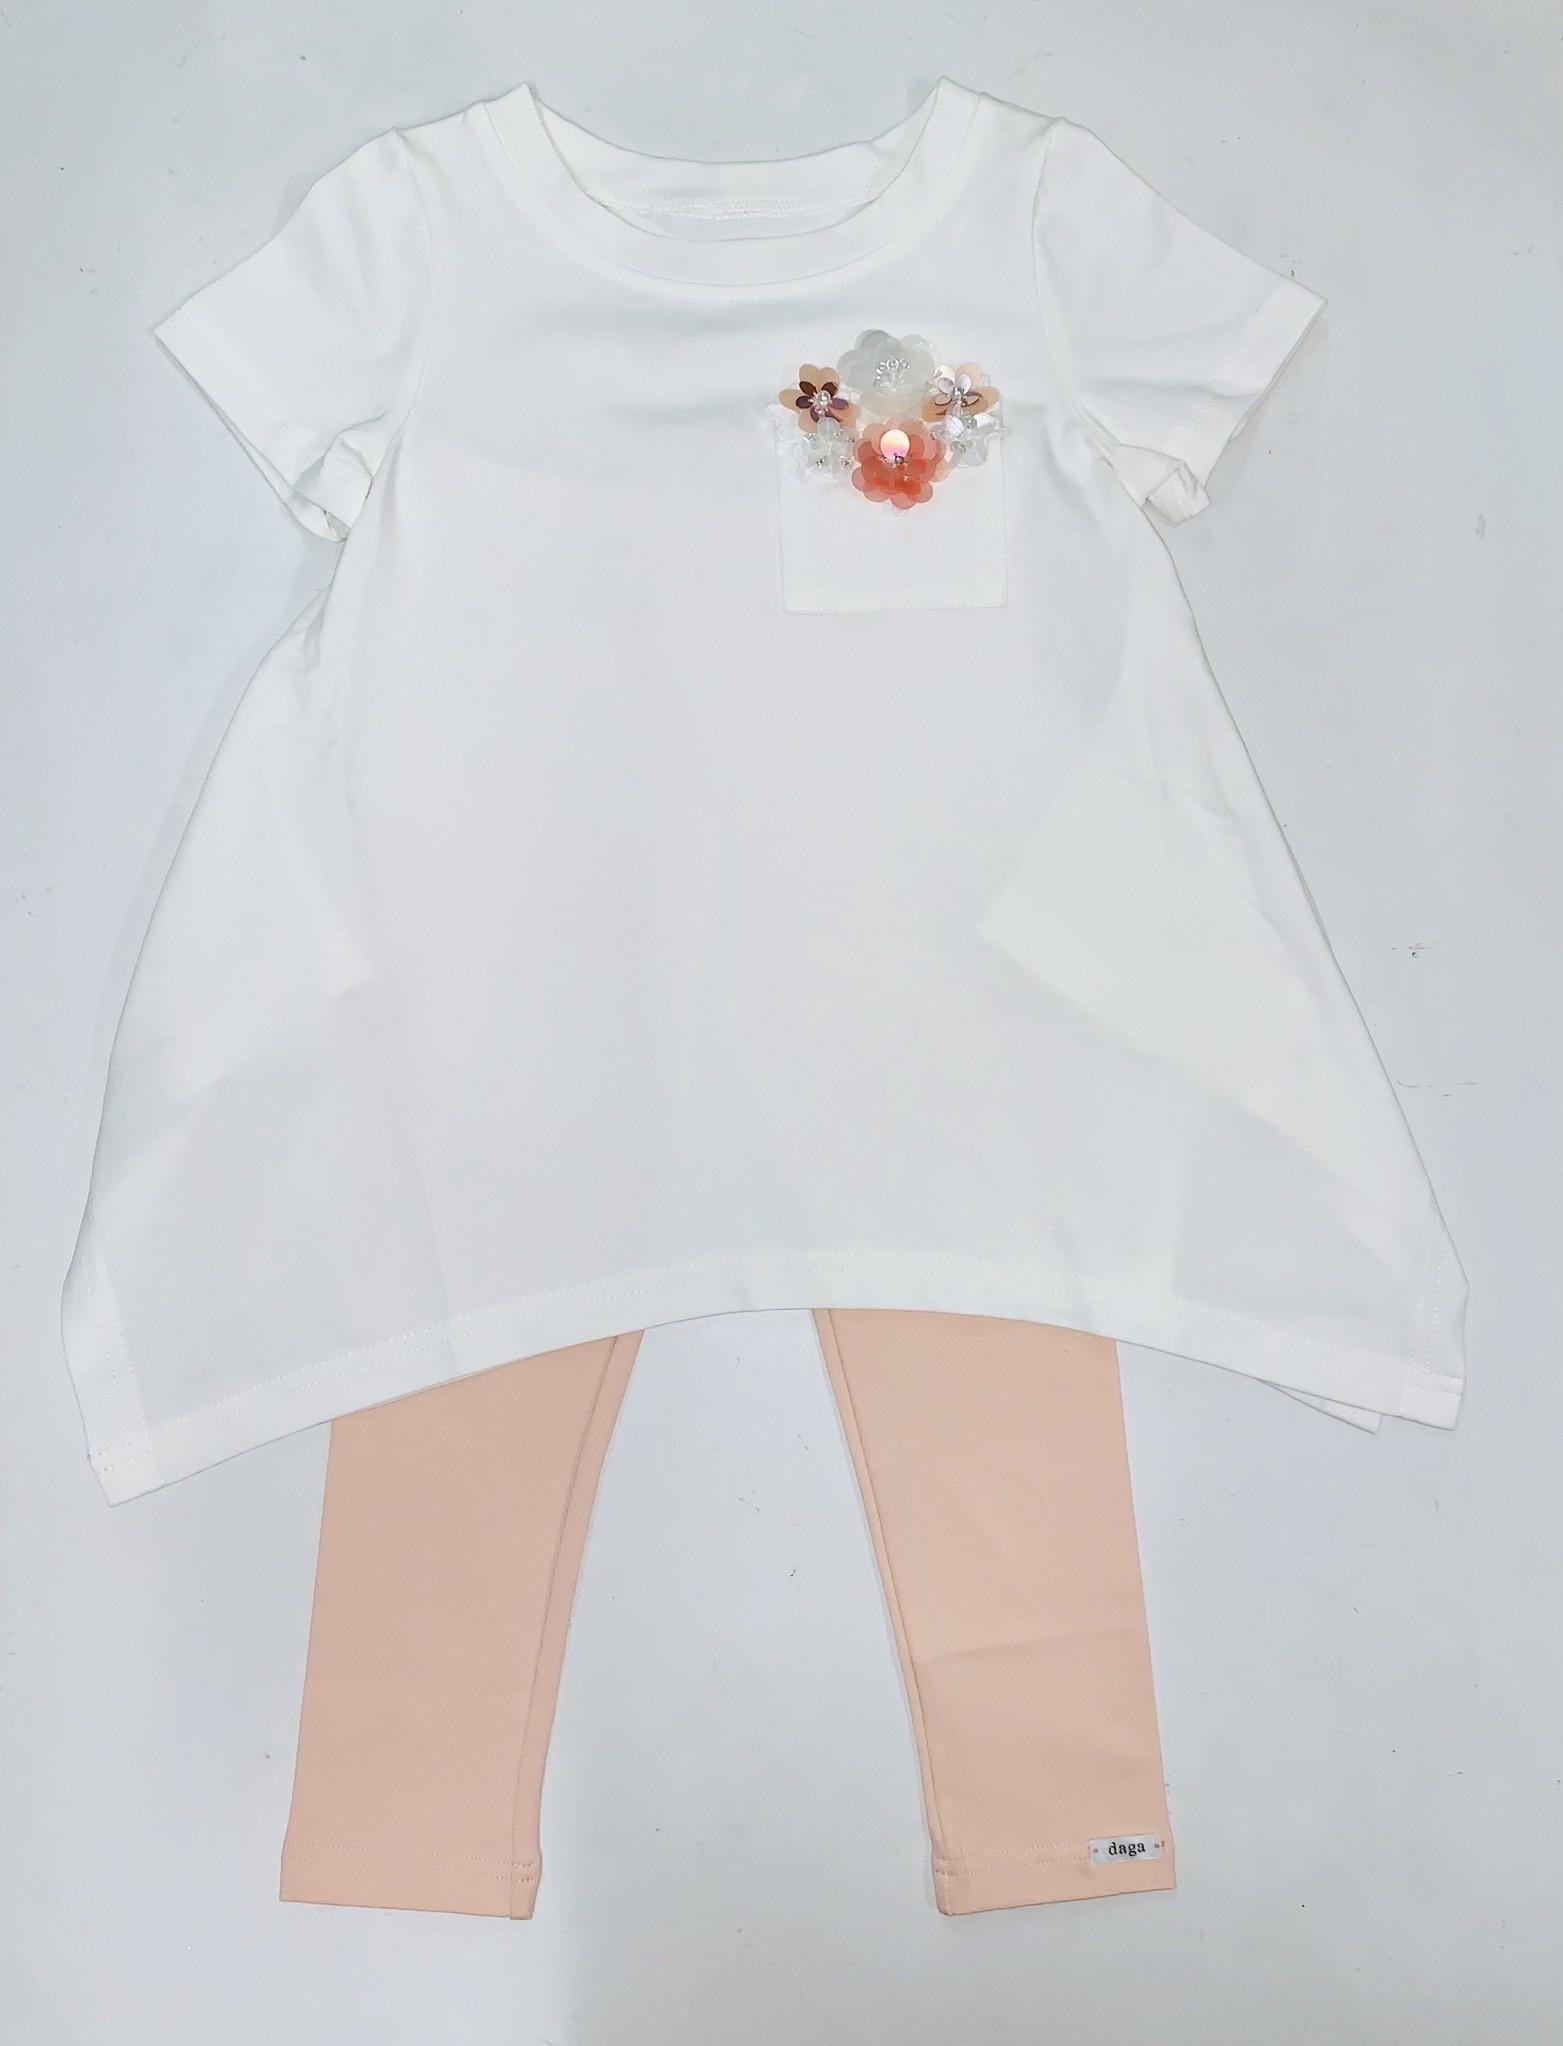 Daga Daga Girls 2 Piece Set with Flower Pocket